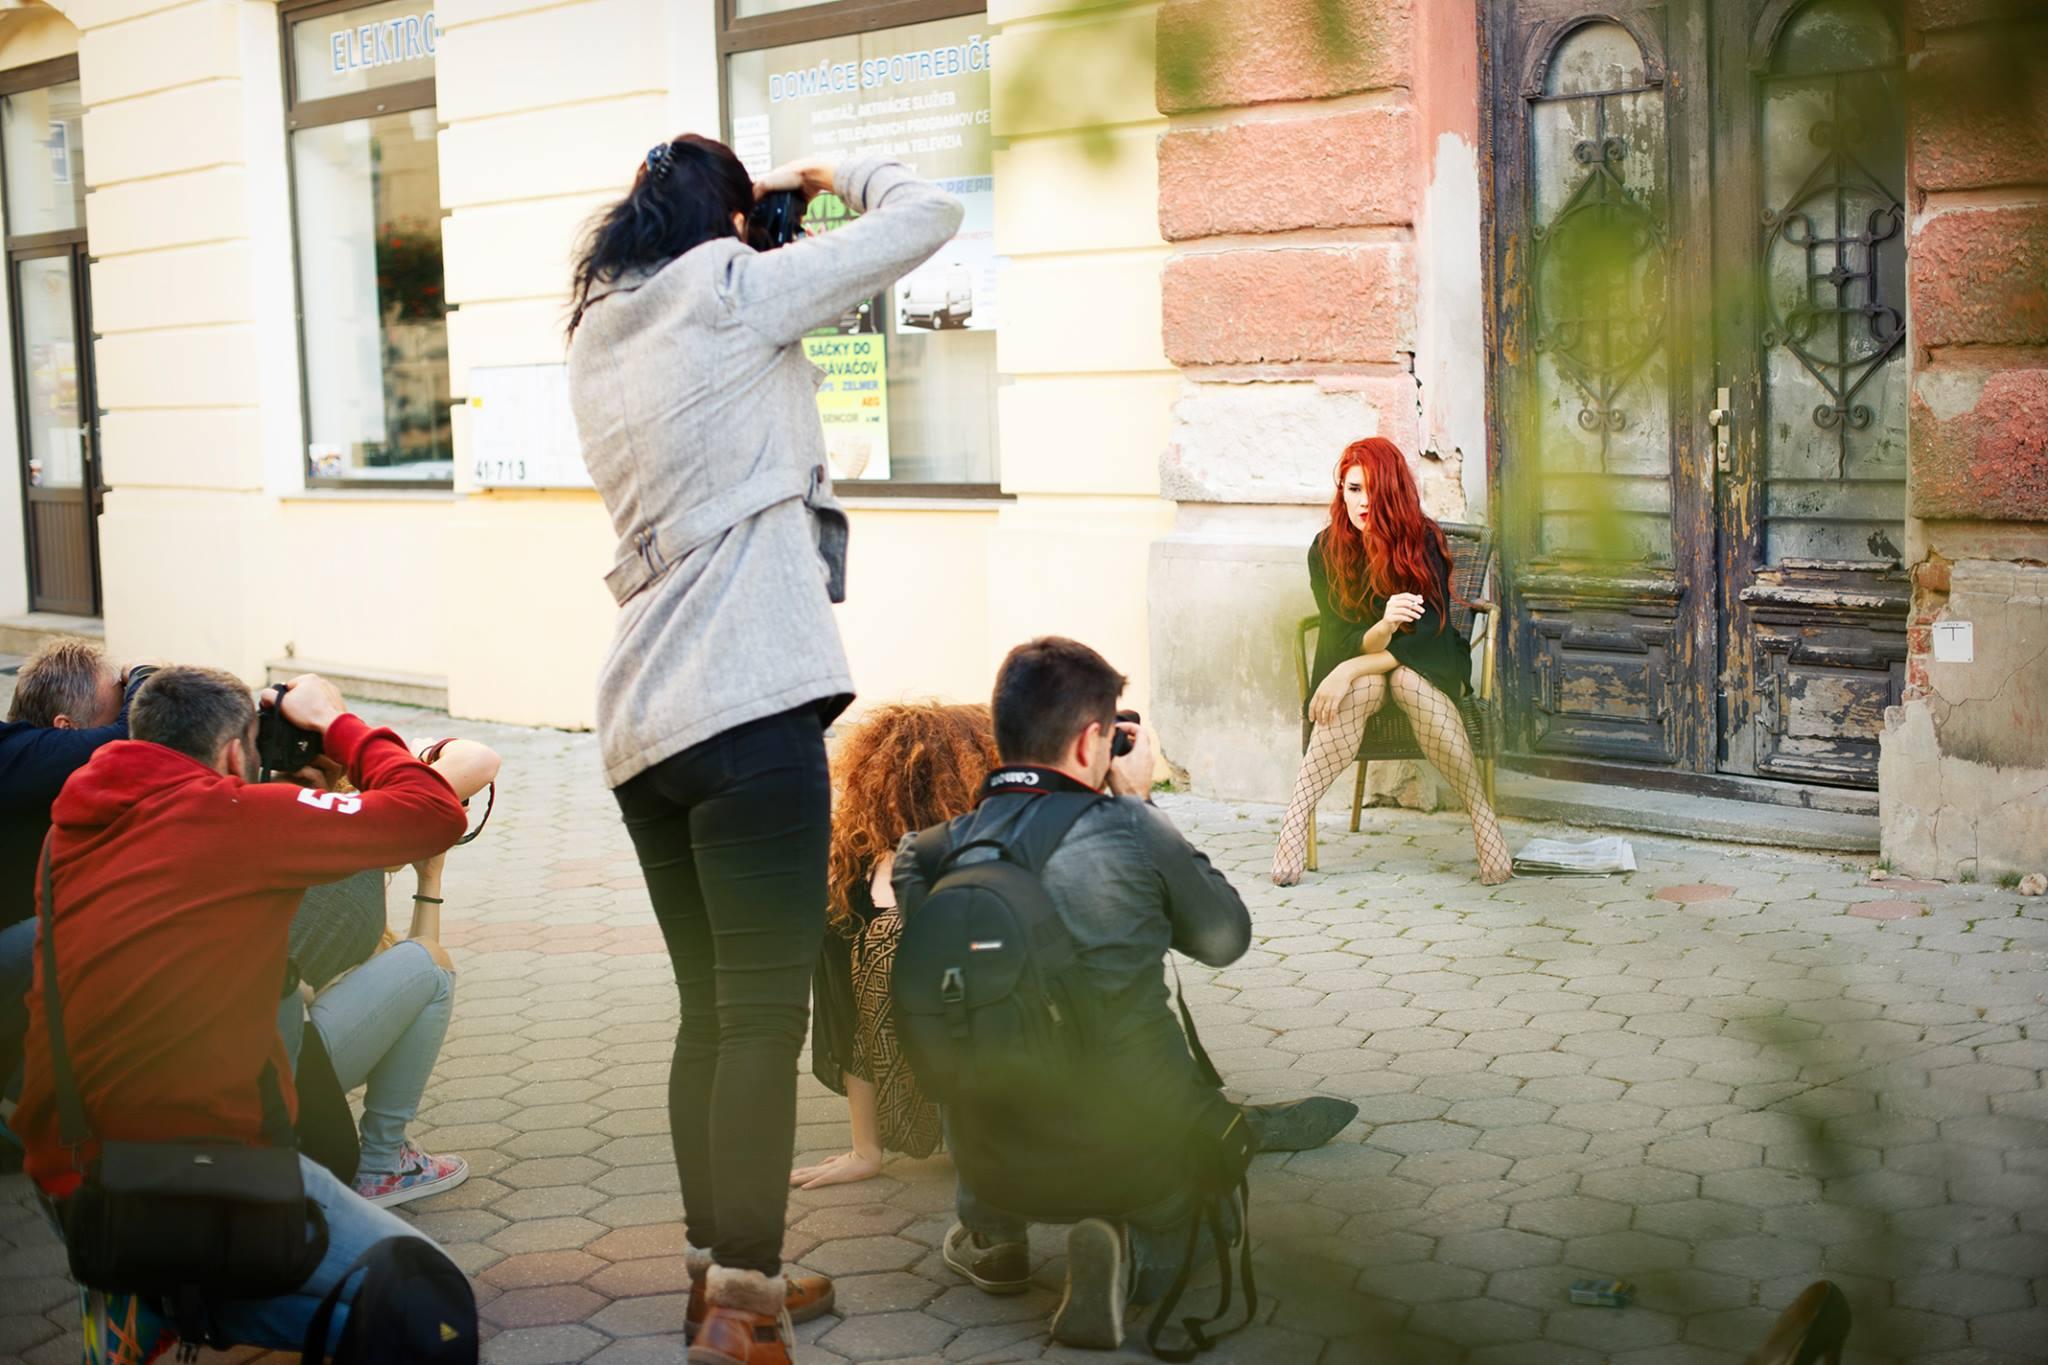 fotokruzok-levice-fotokurzy-ukazky-fotiek-na-uvode-14